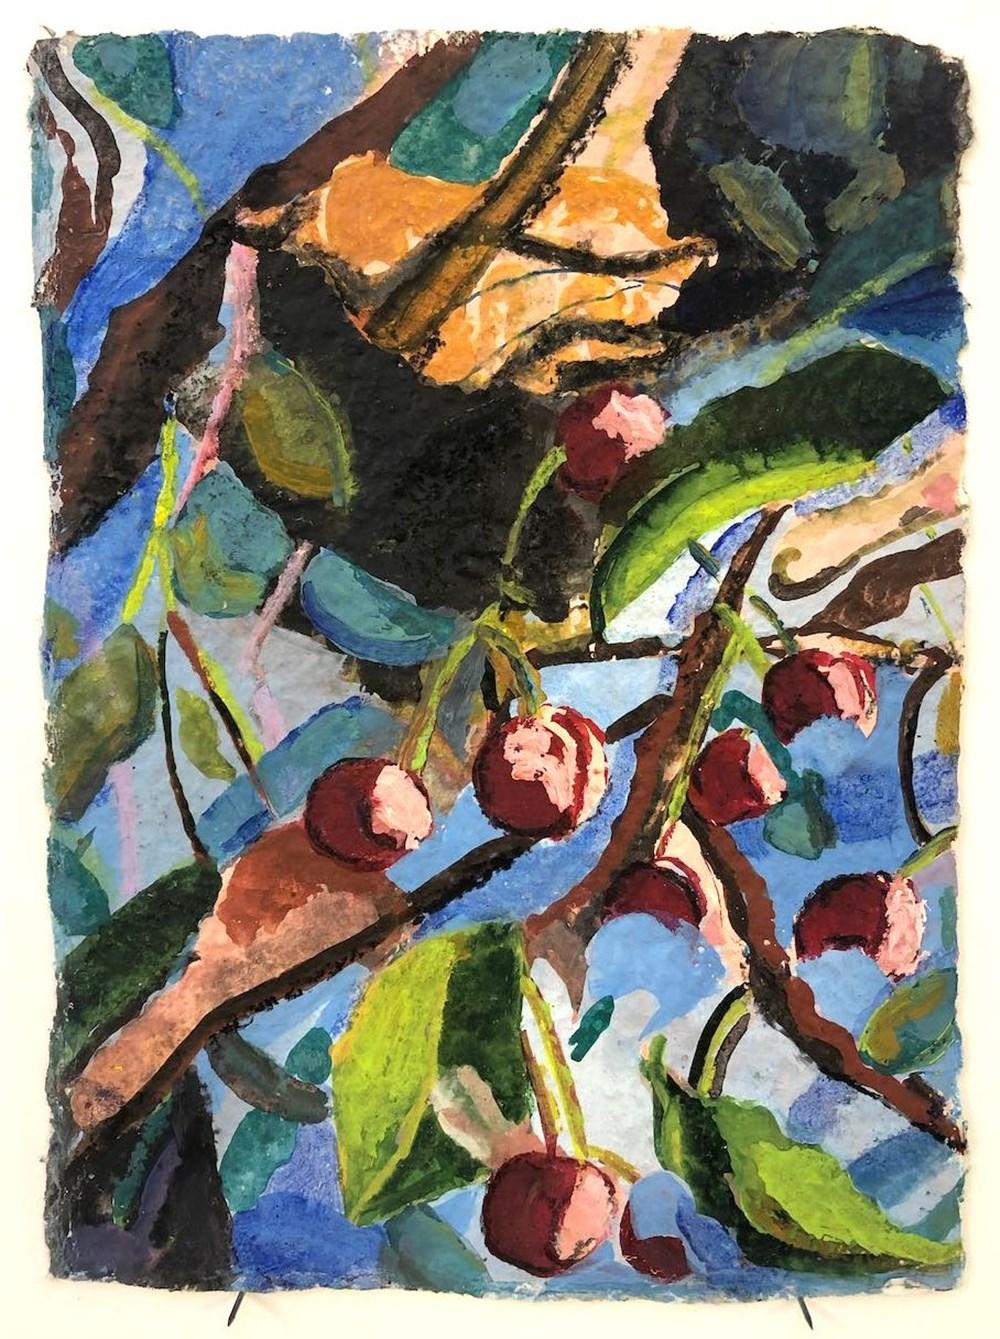 Life on Venus | The Landscape, Timed Auction - Lot 61, Maija Lassila, Cherry Harvest